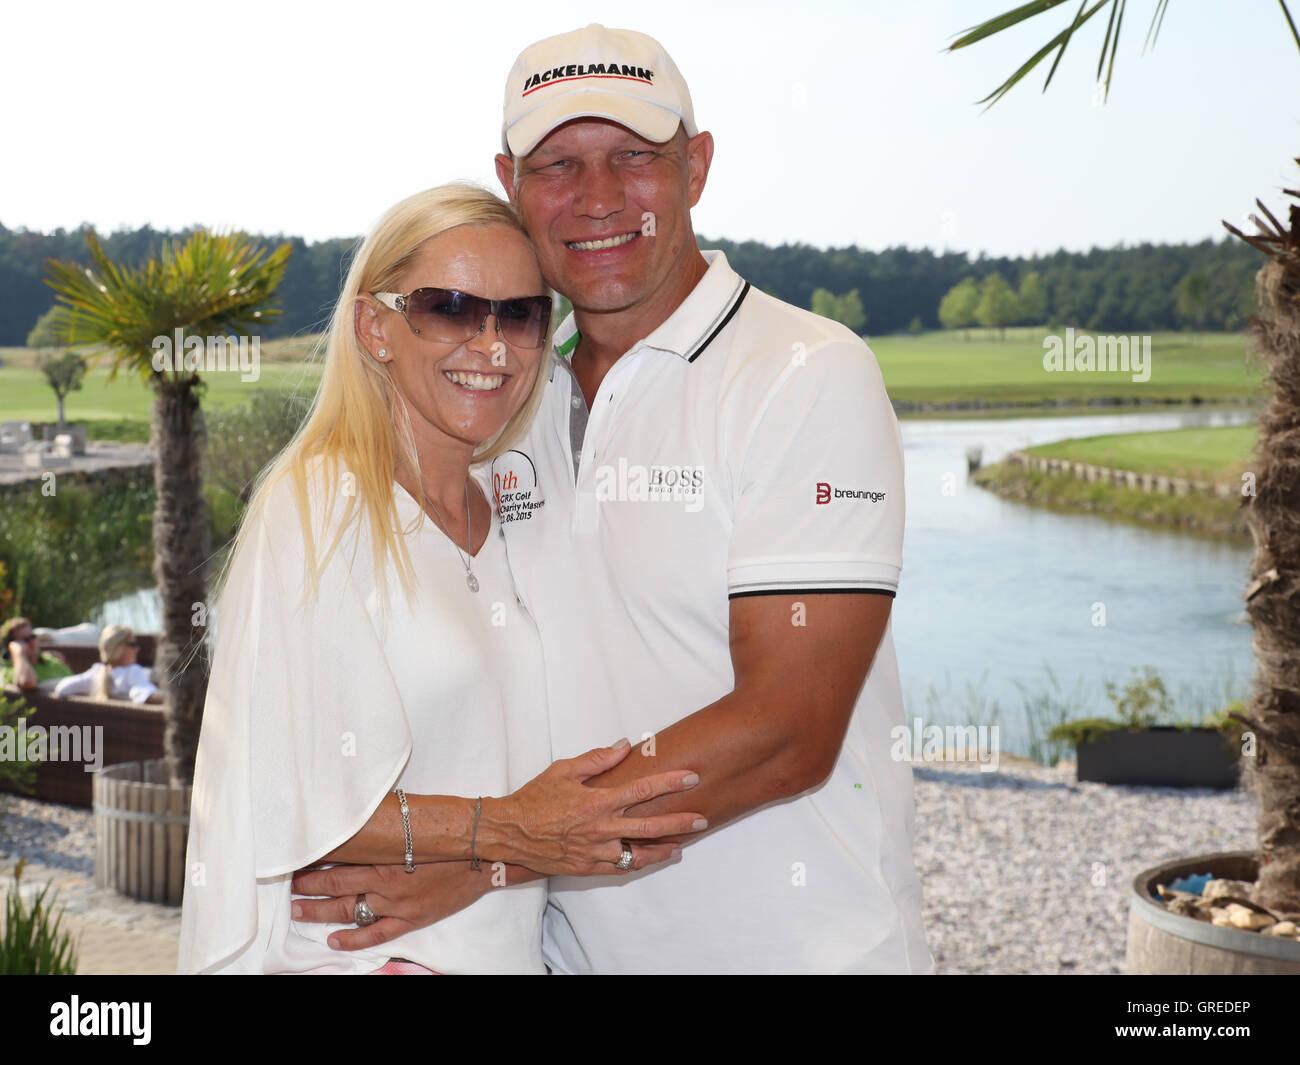 Axel Schulz With Wife Patrizia - Stock Image